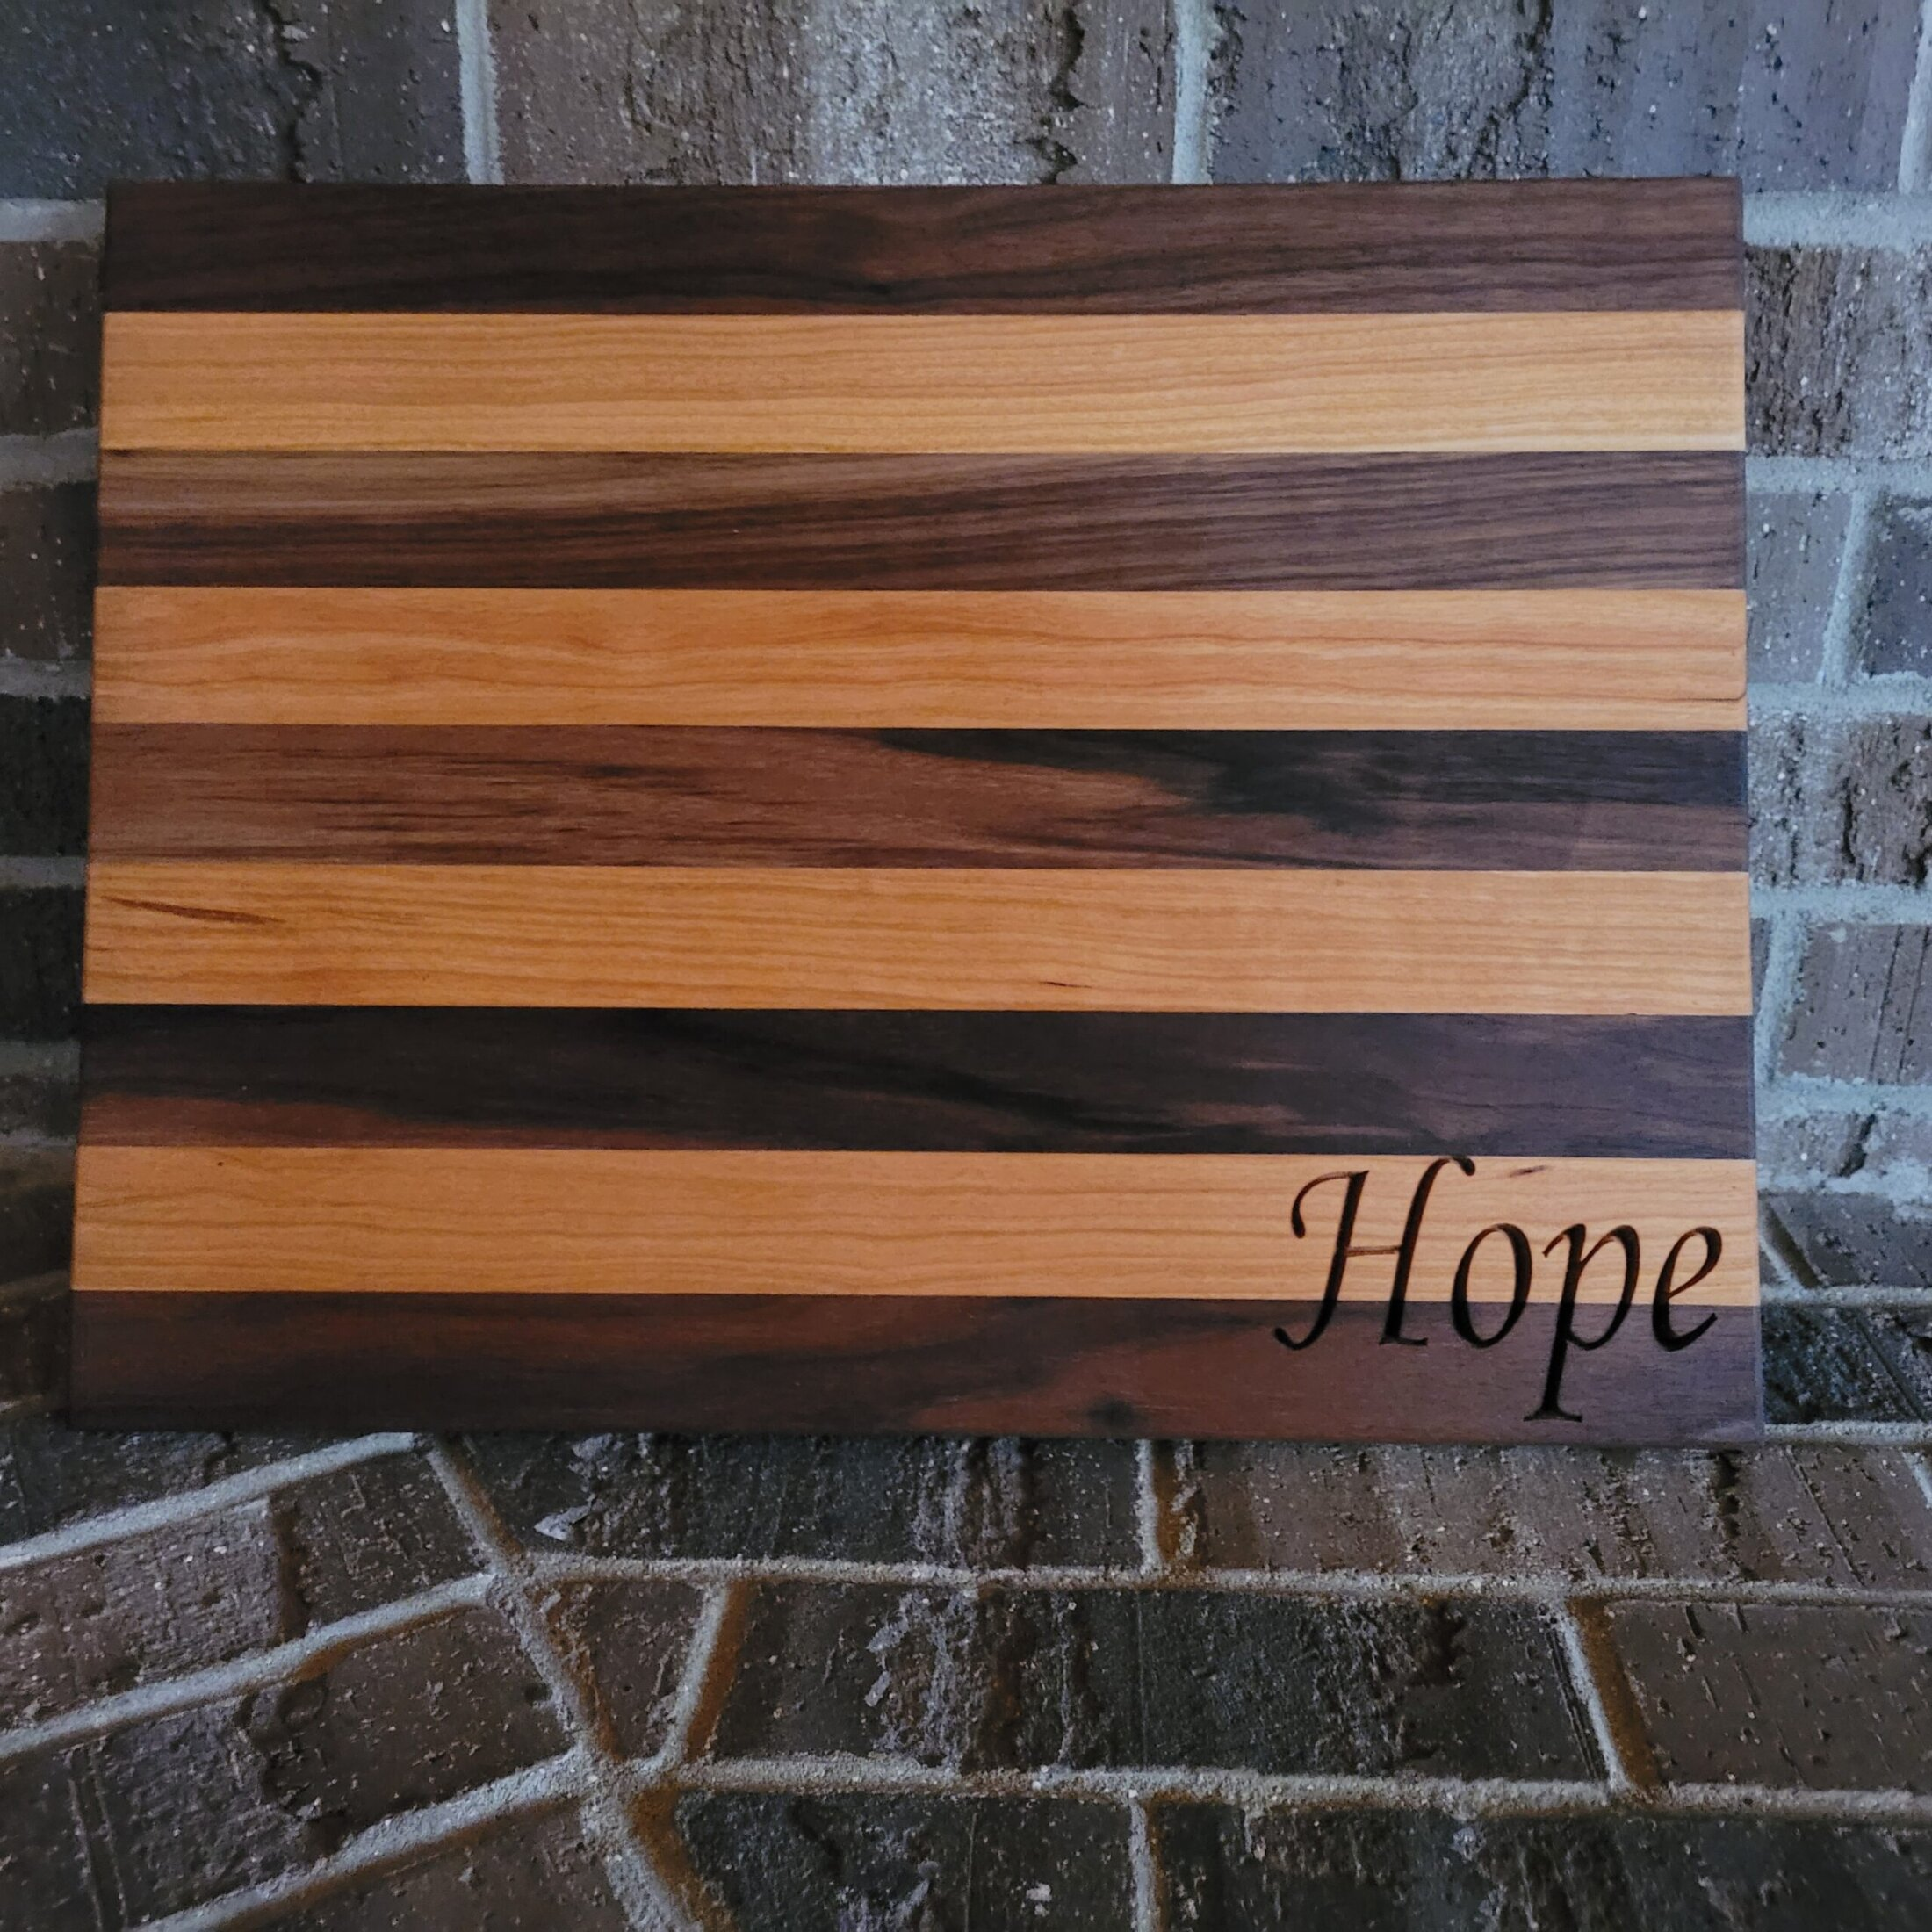 Custom Designed, Carved & Built Cutting Board